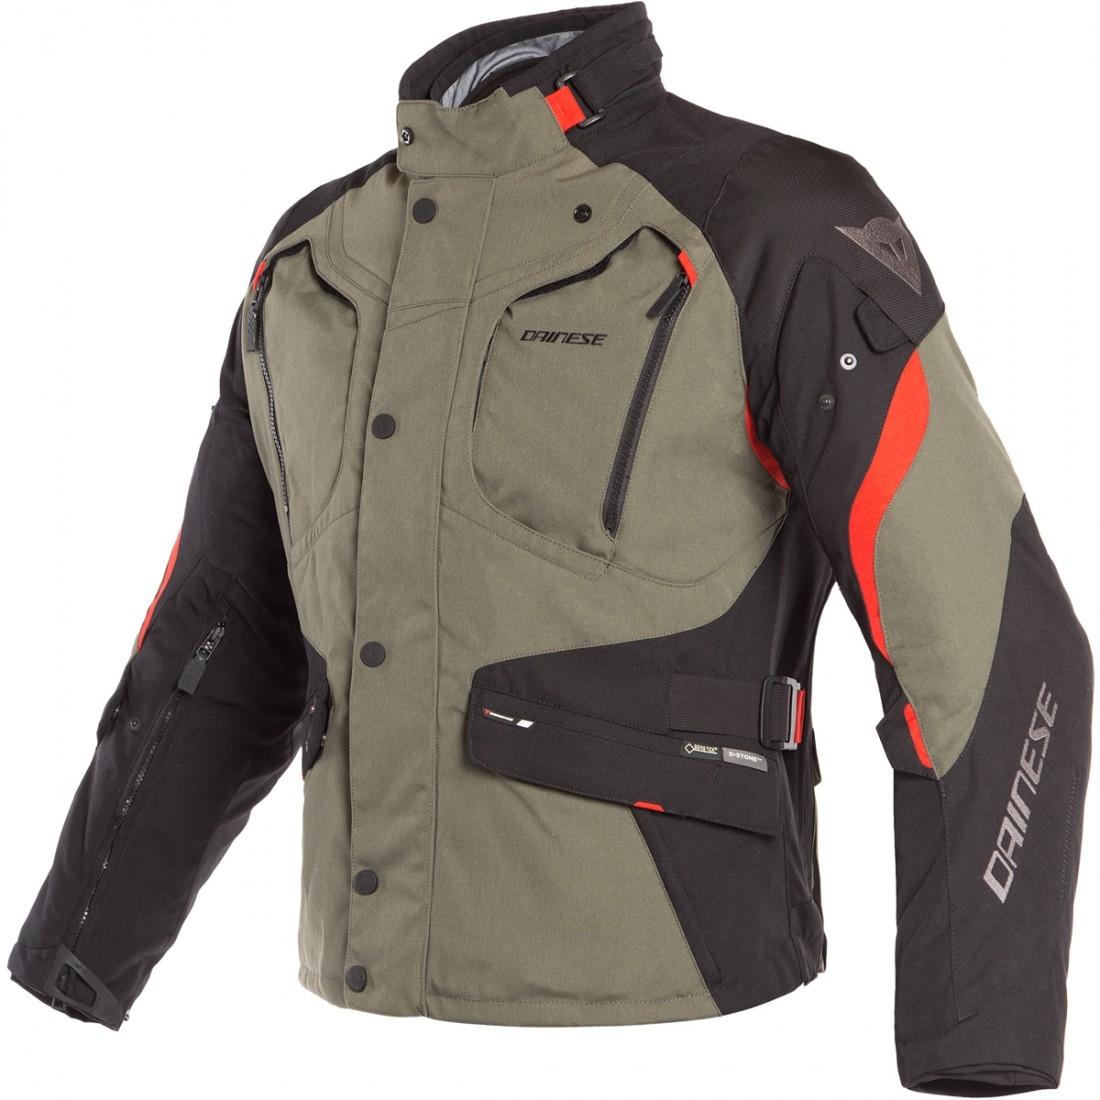 günstig kaufen offiziell abholen Jacke DAINESE Dolomiti Gore-Tex Grape-Leaf / Black / Red